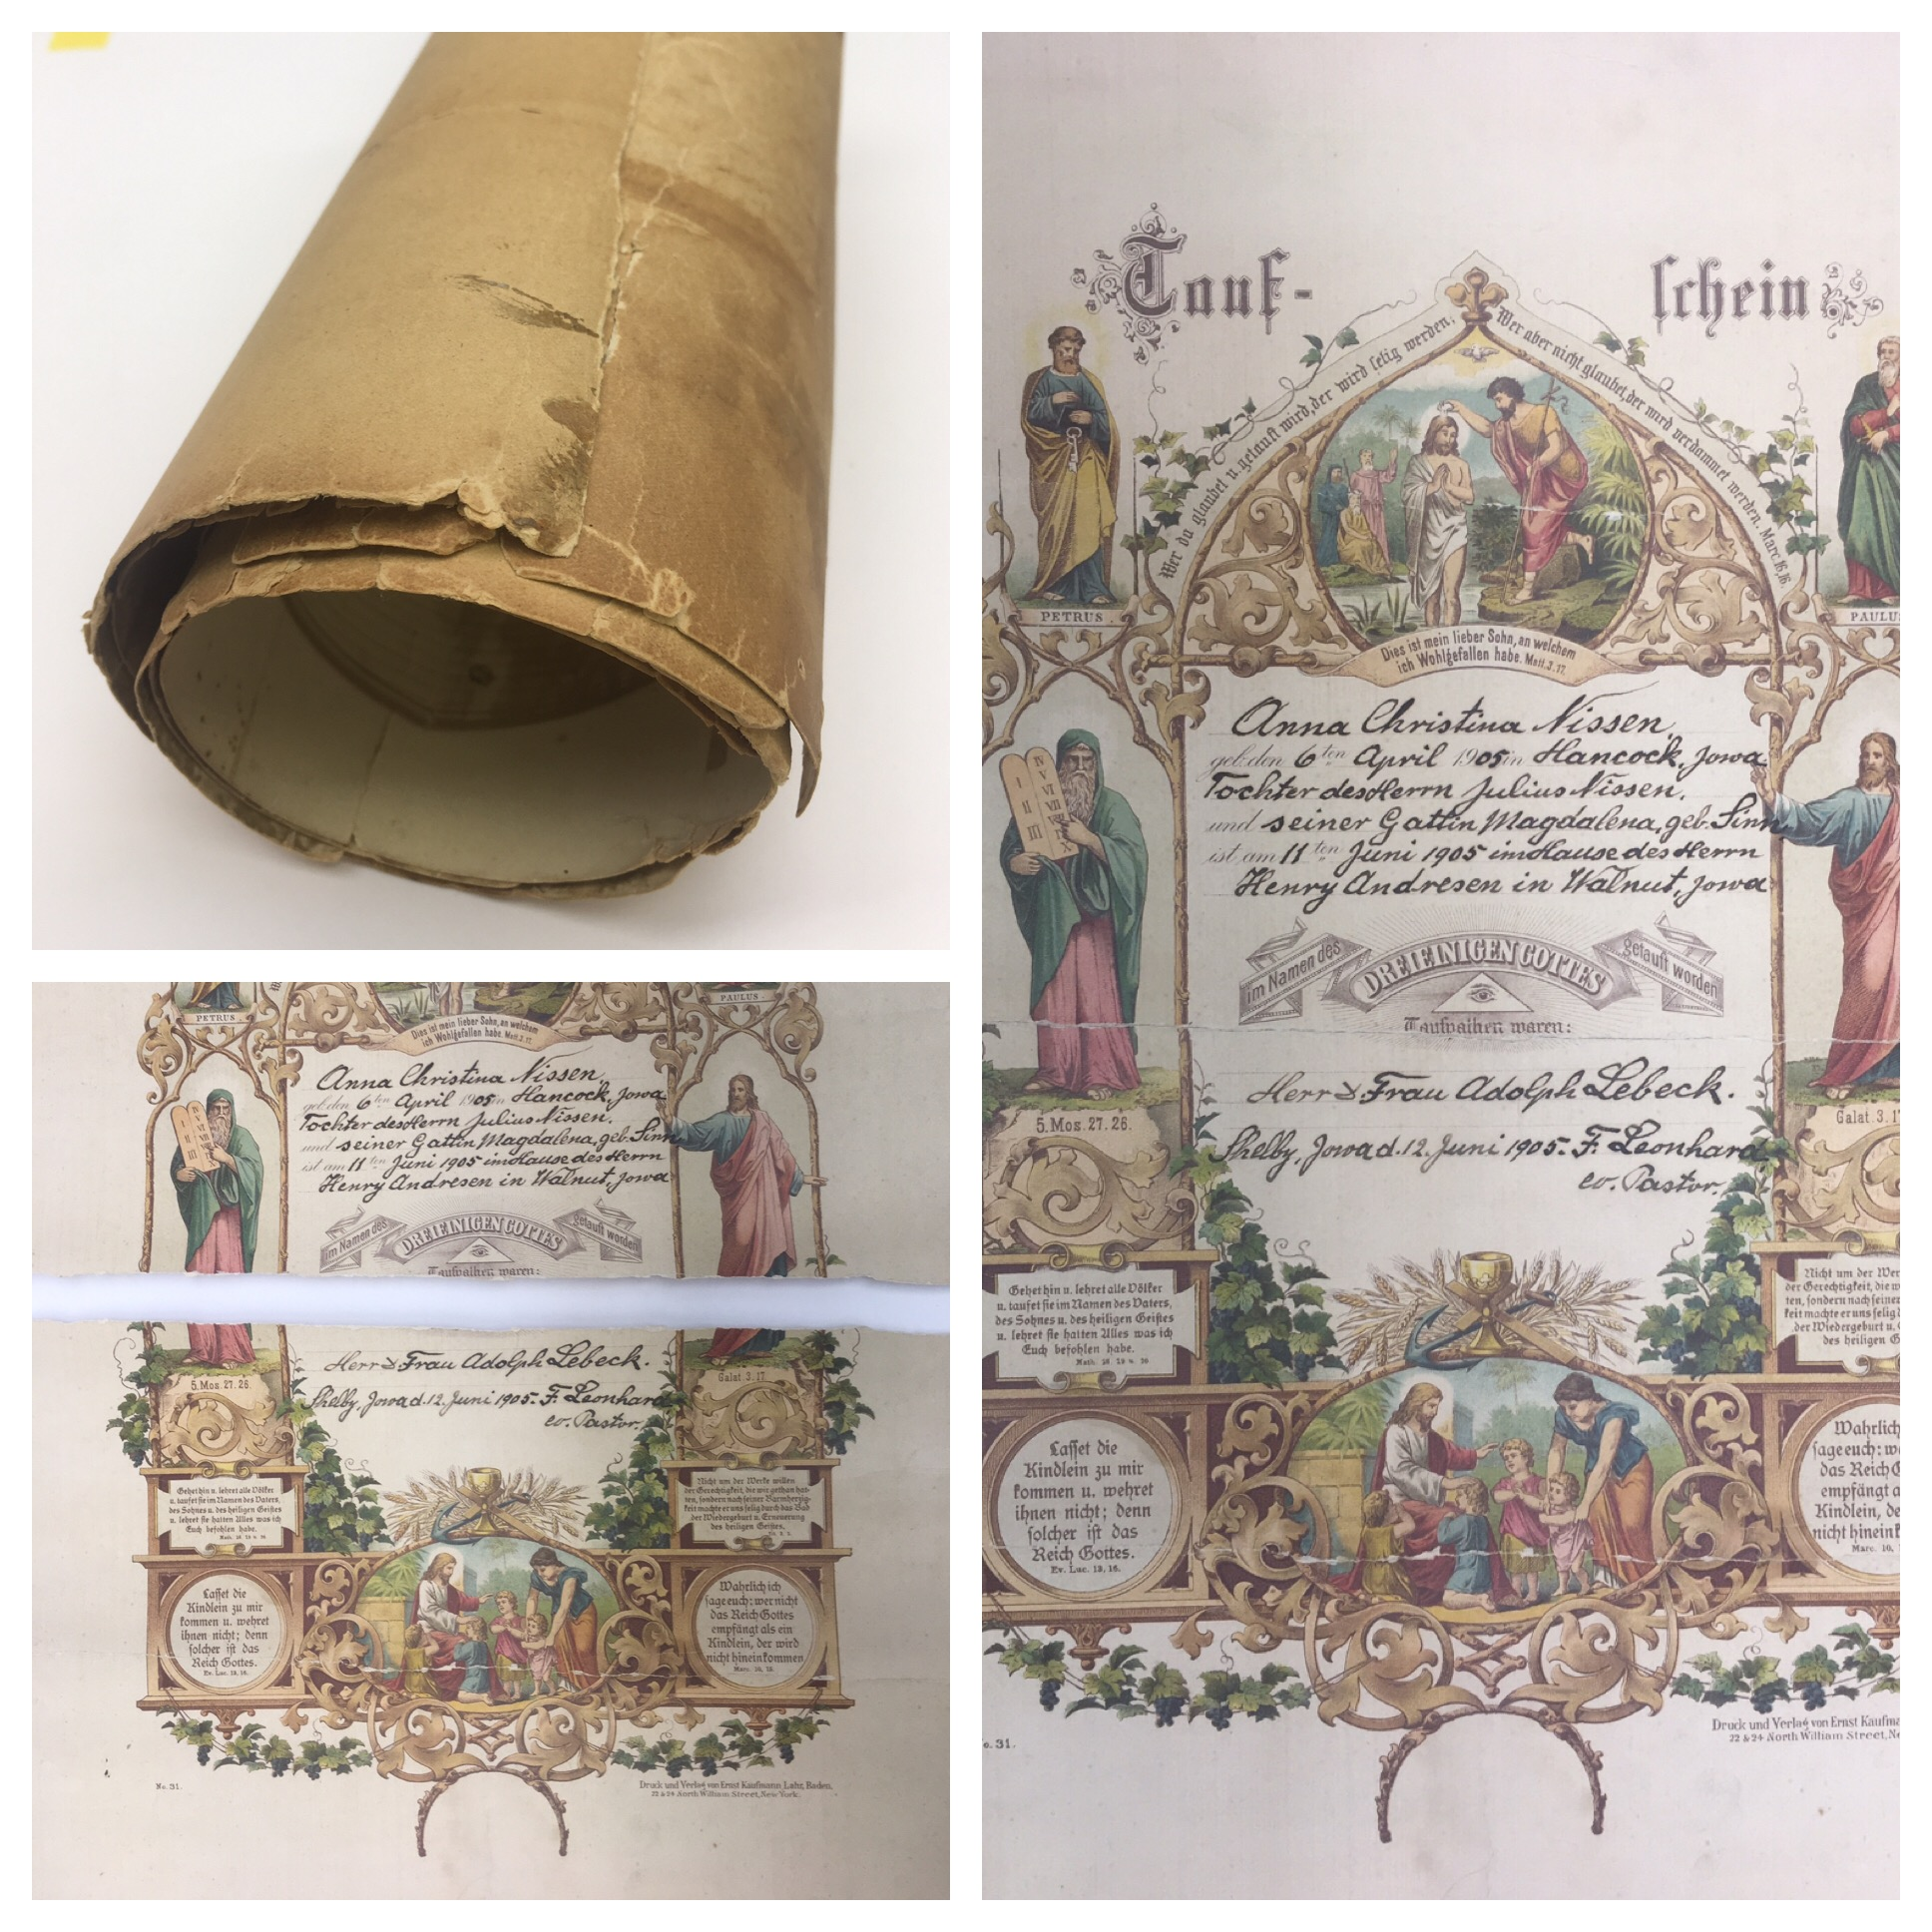 Paper Conservatiion and Restoration | Document Restoration